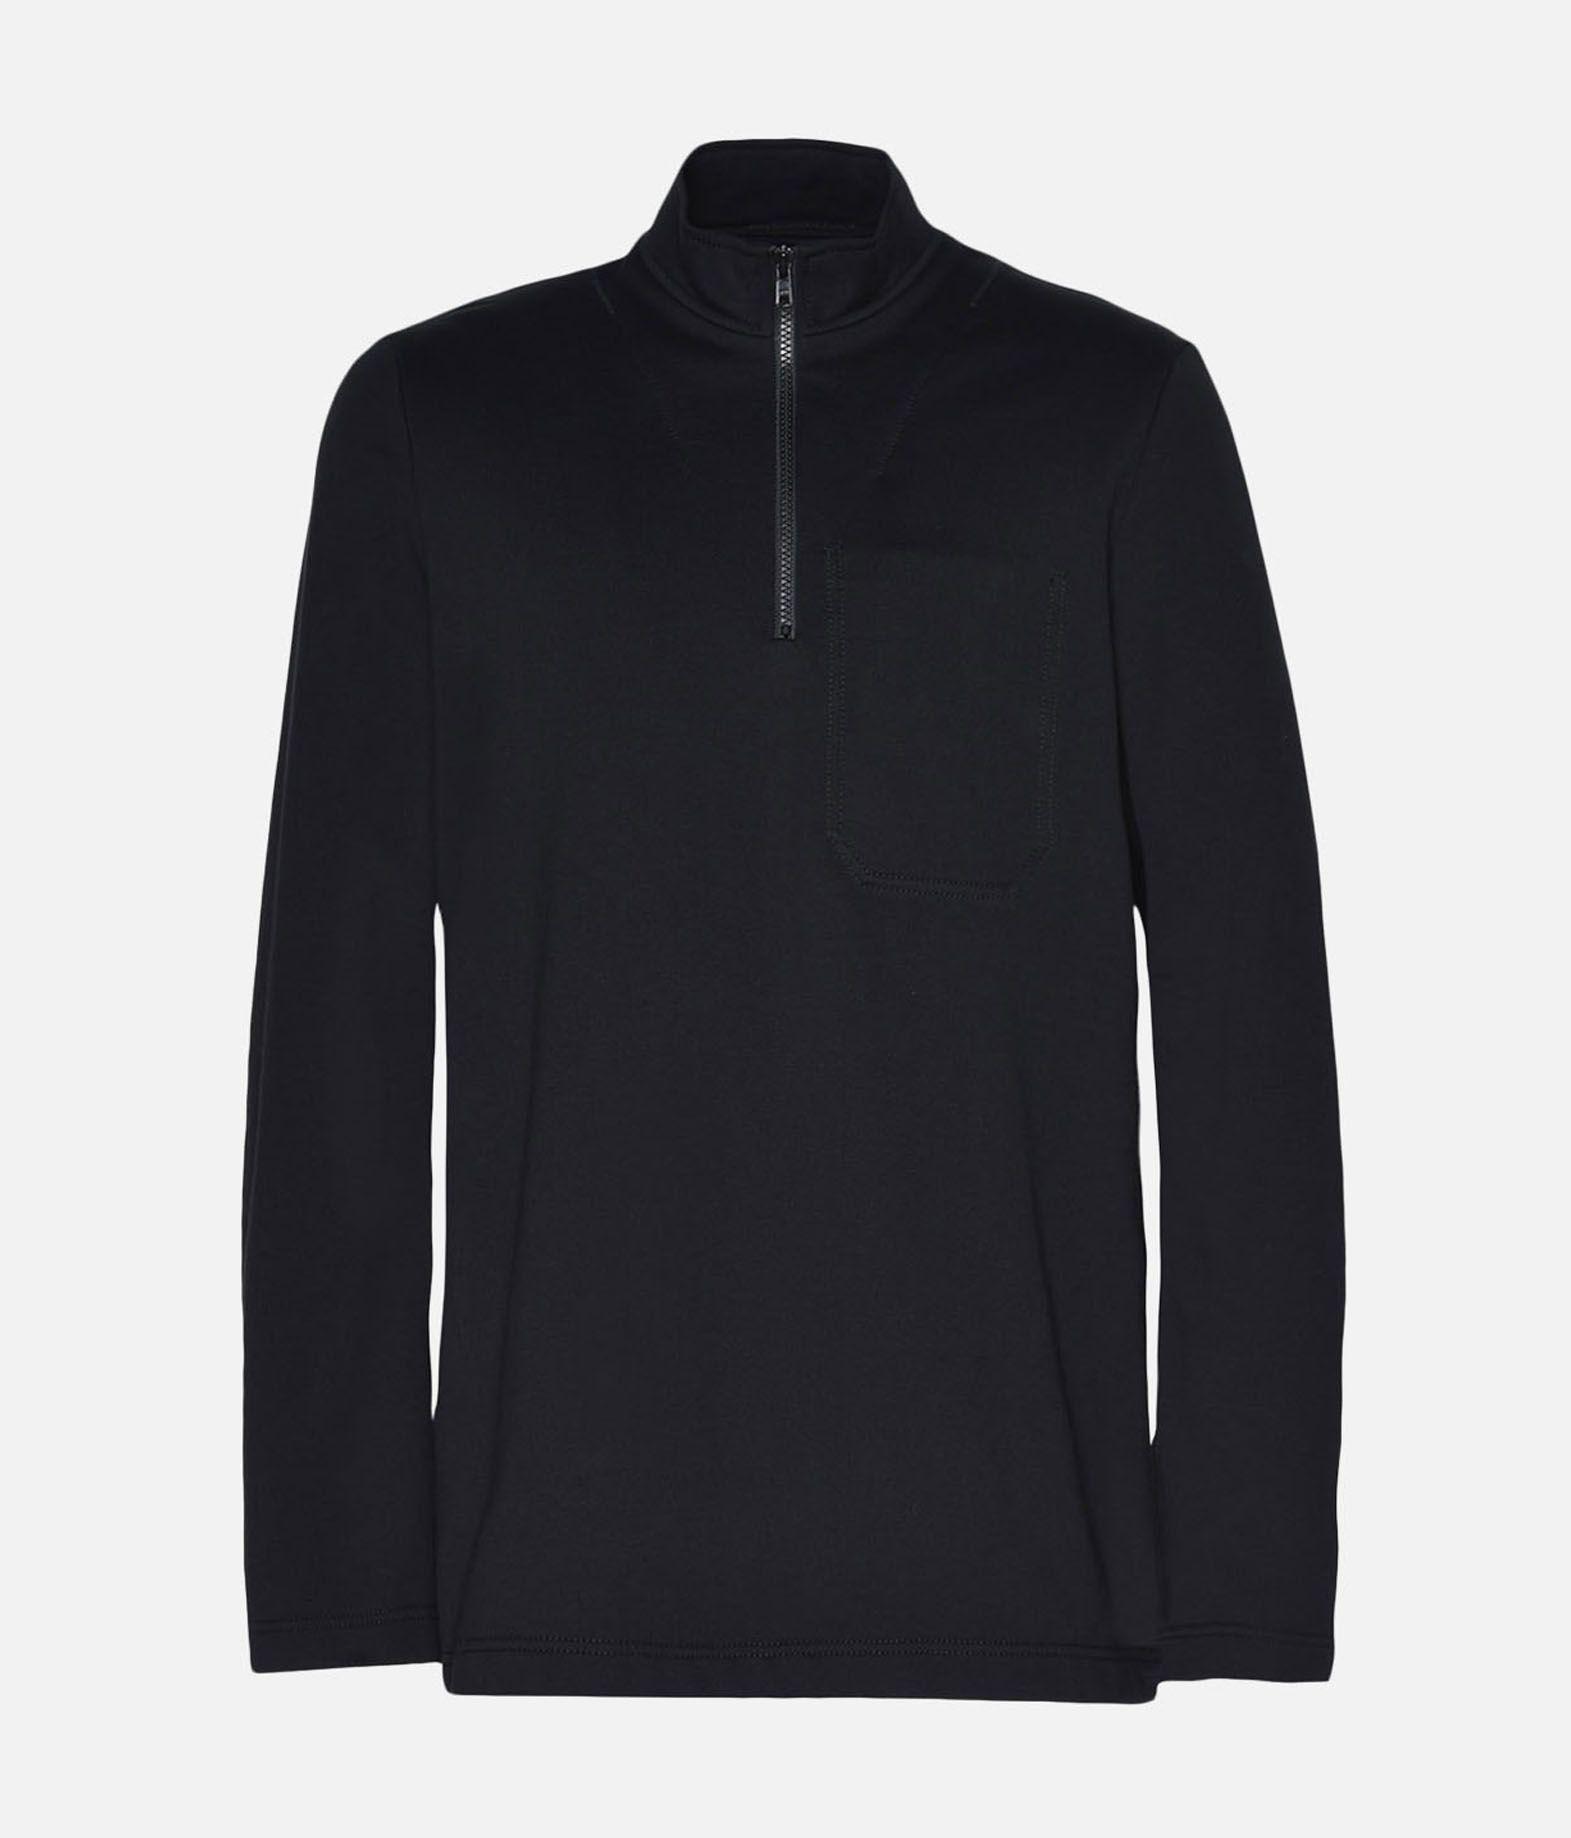 Y-3 Y-3 Sashiko Sweater スウェットブルゾン メンズ f